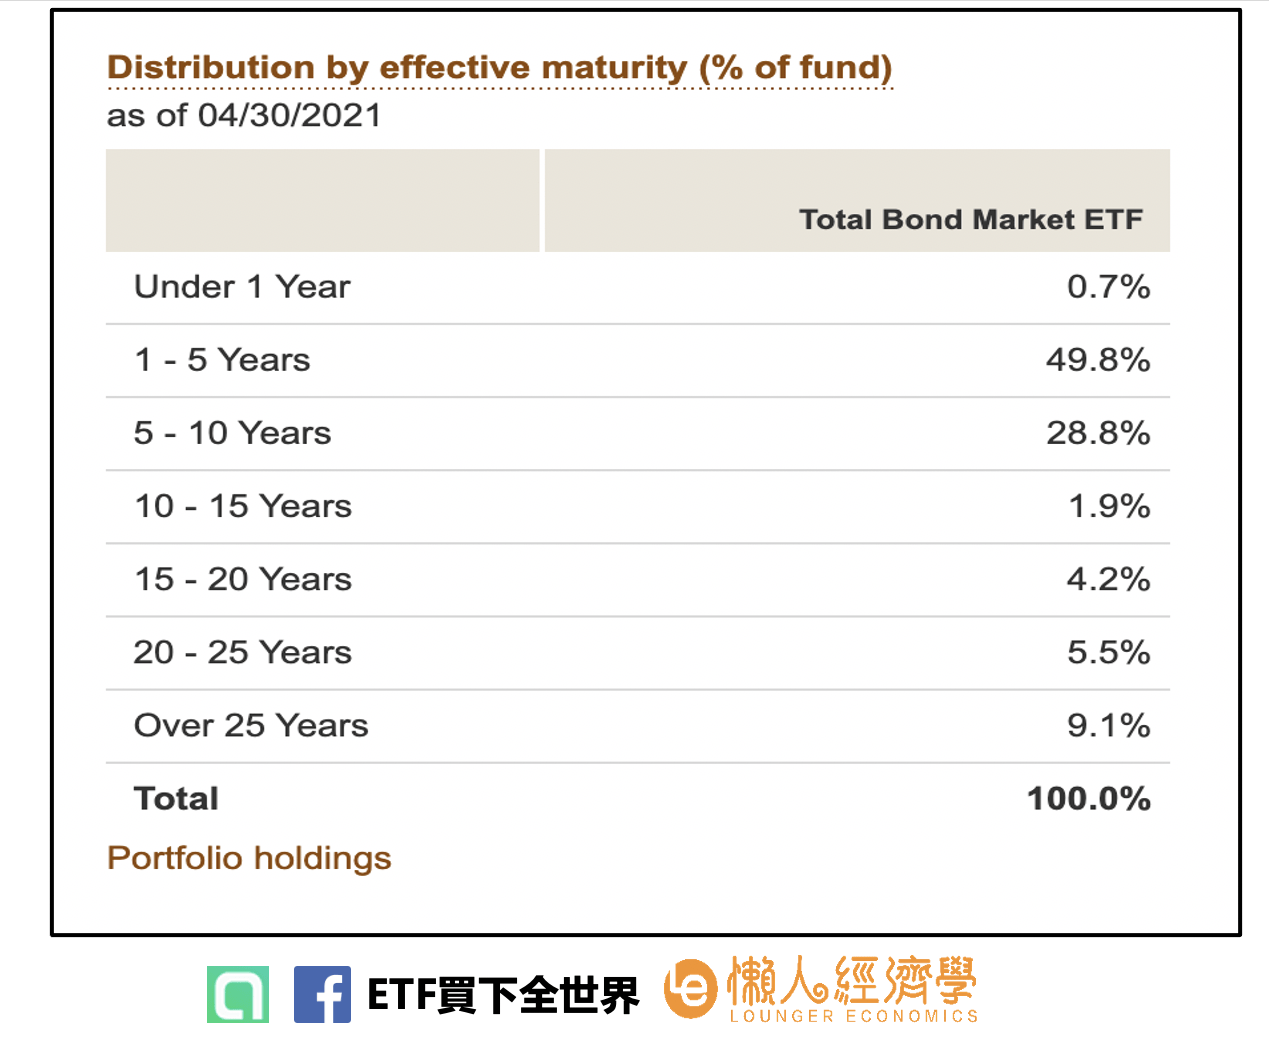 持債到期年限(Effective maturity)